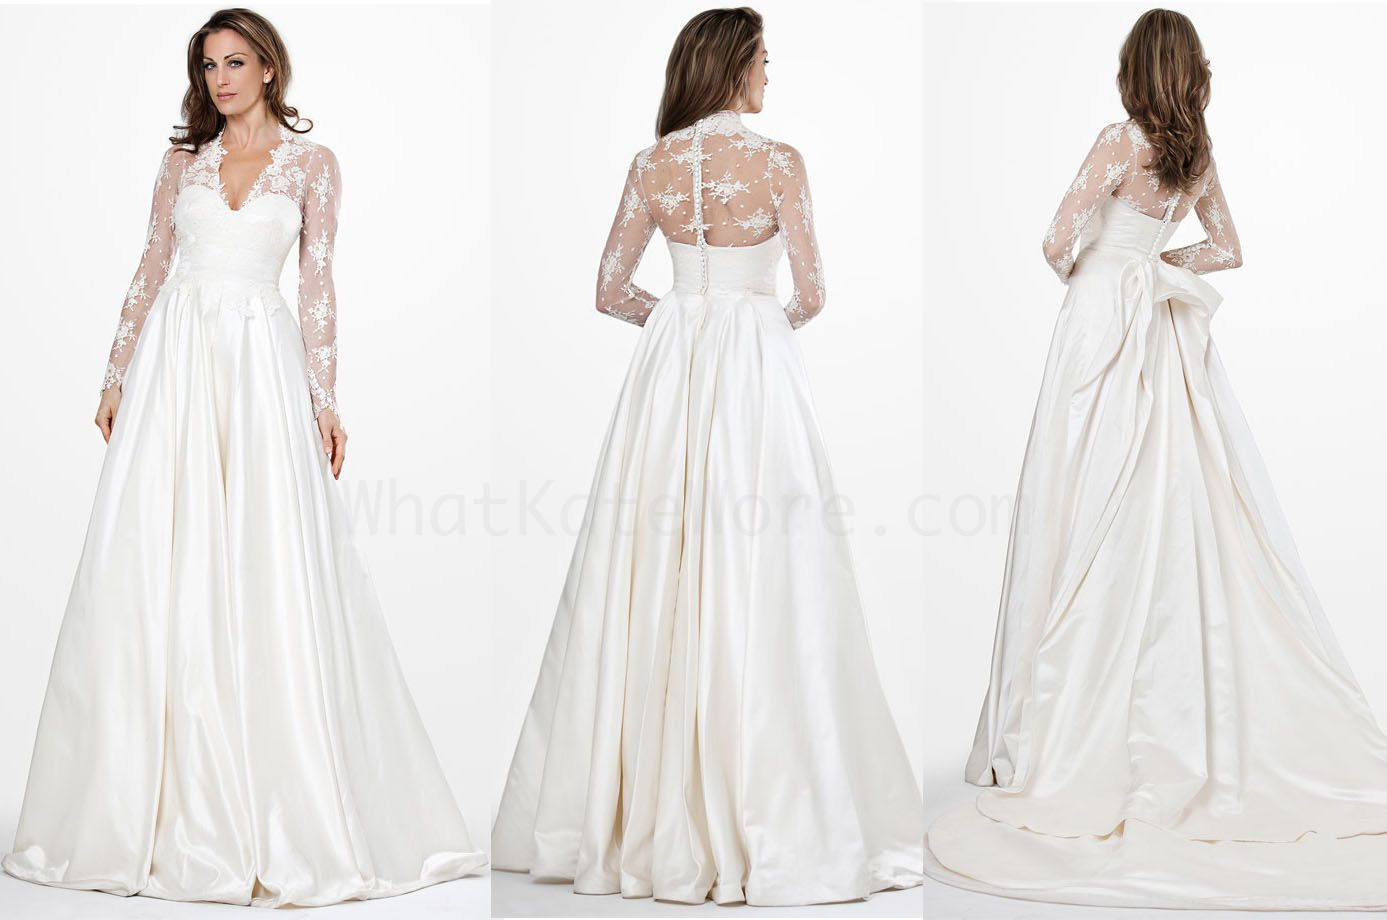 Princess Kate Royal Wedding Dress YouTube #22987 | theweddingplans ...